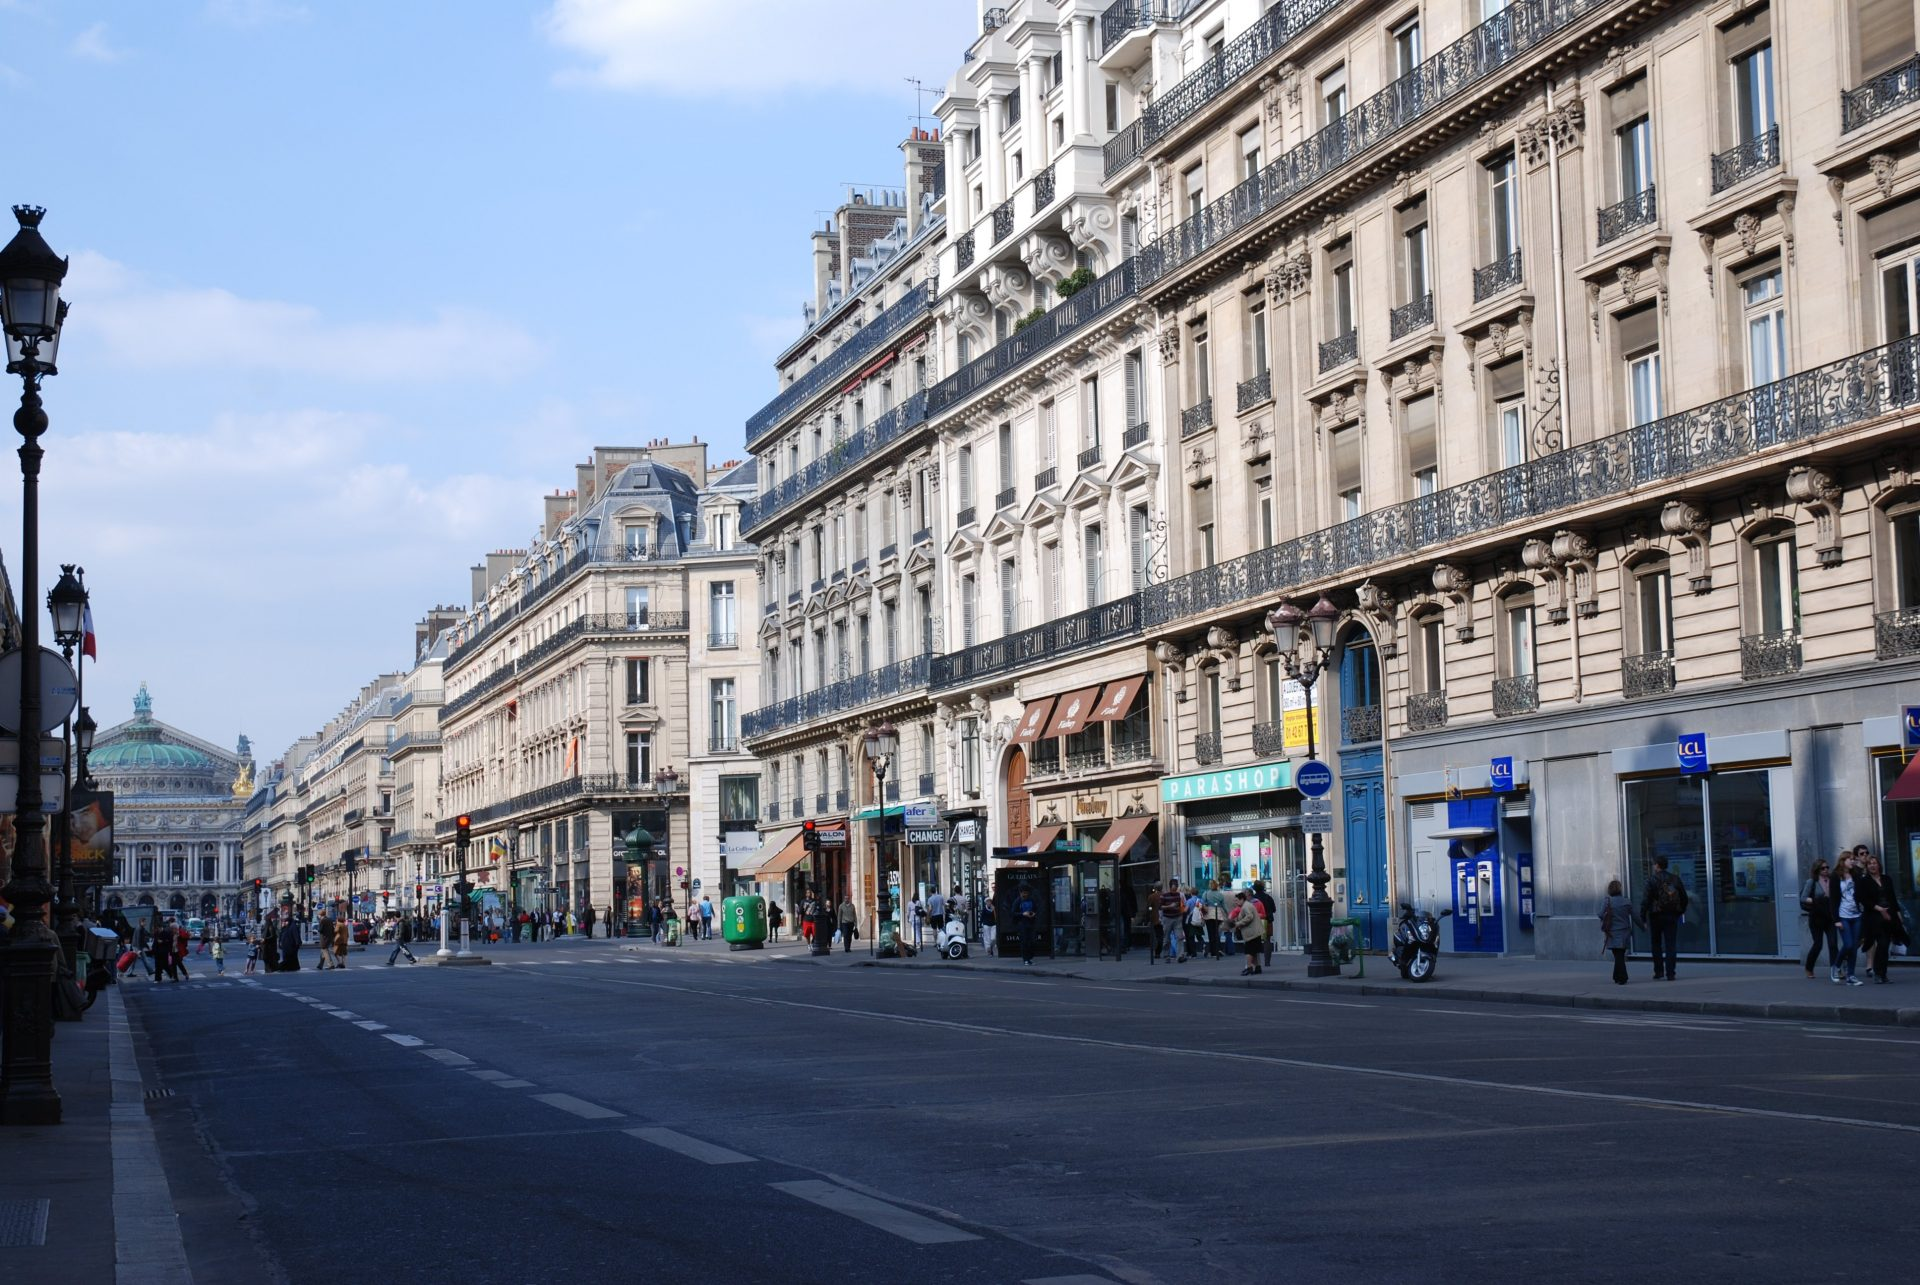 Avenue de l'Opéra, Париж, Франция. Апрель, 2011